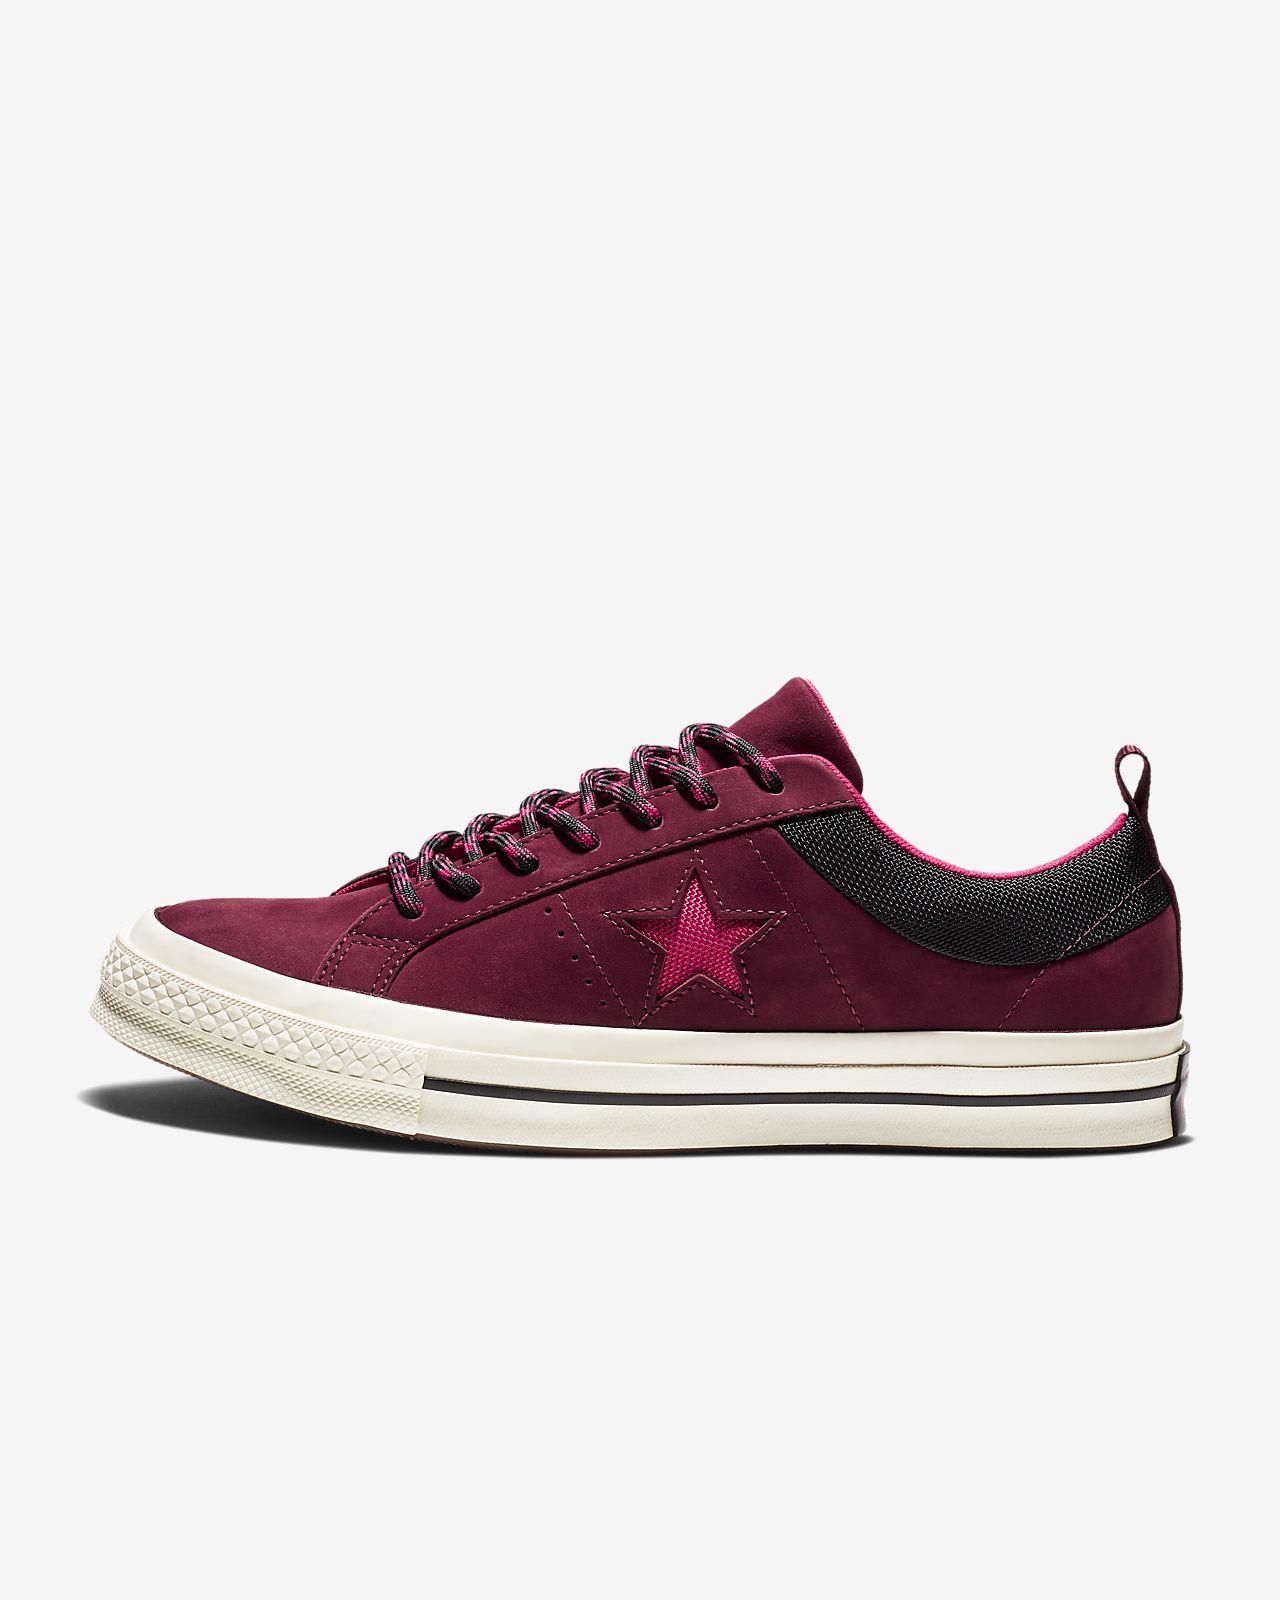 Converse One Star Sierra Leather Low Top  Unisex Shoe